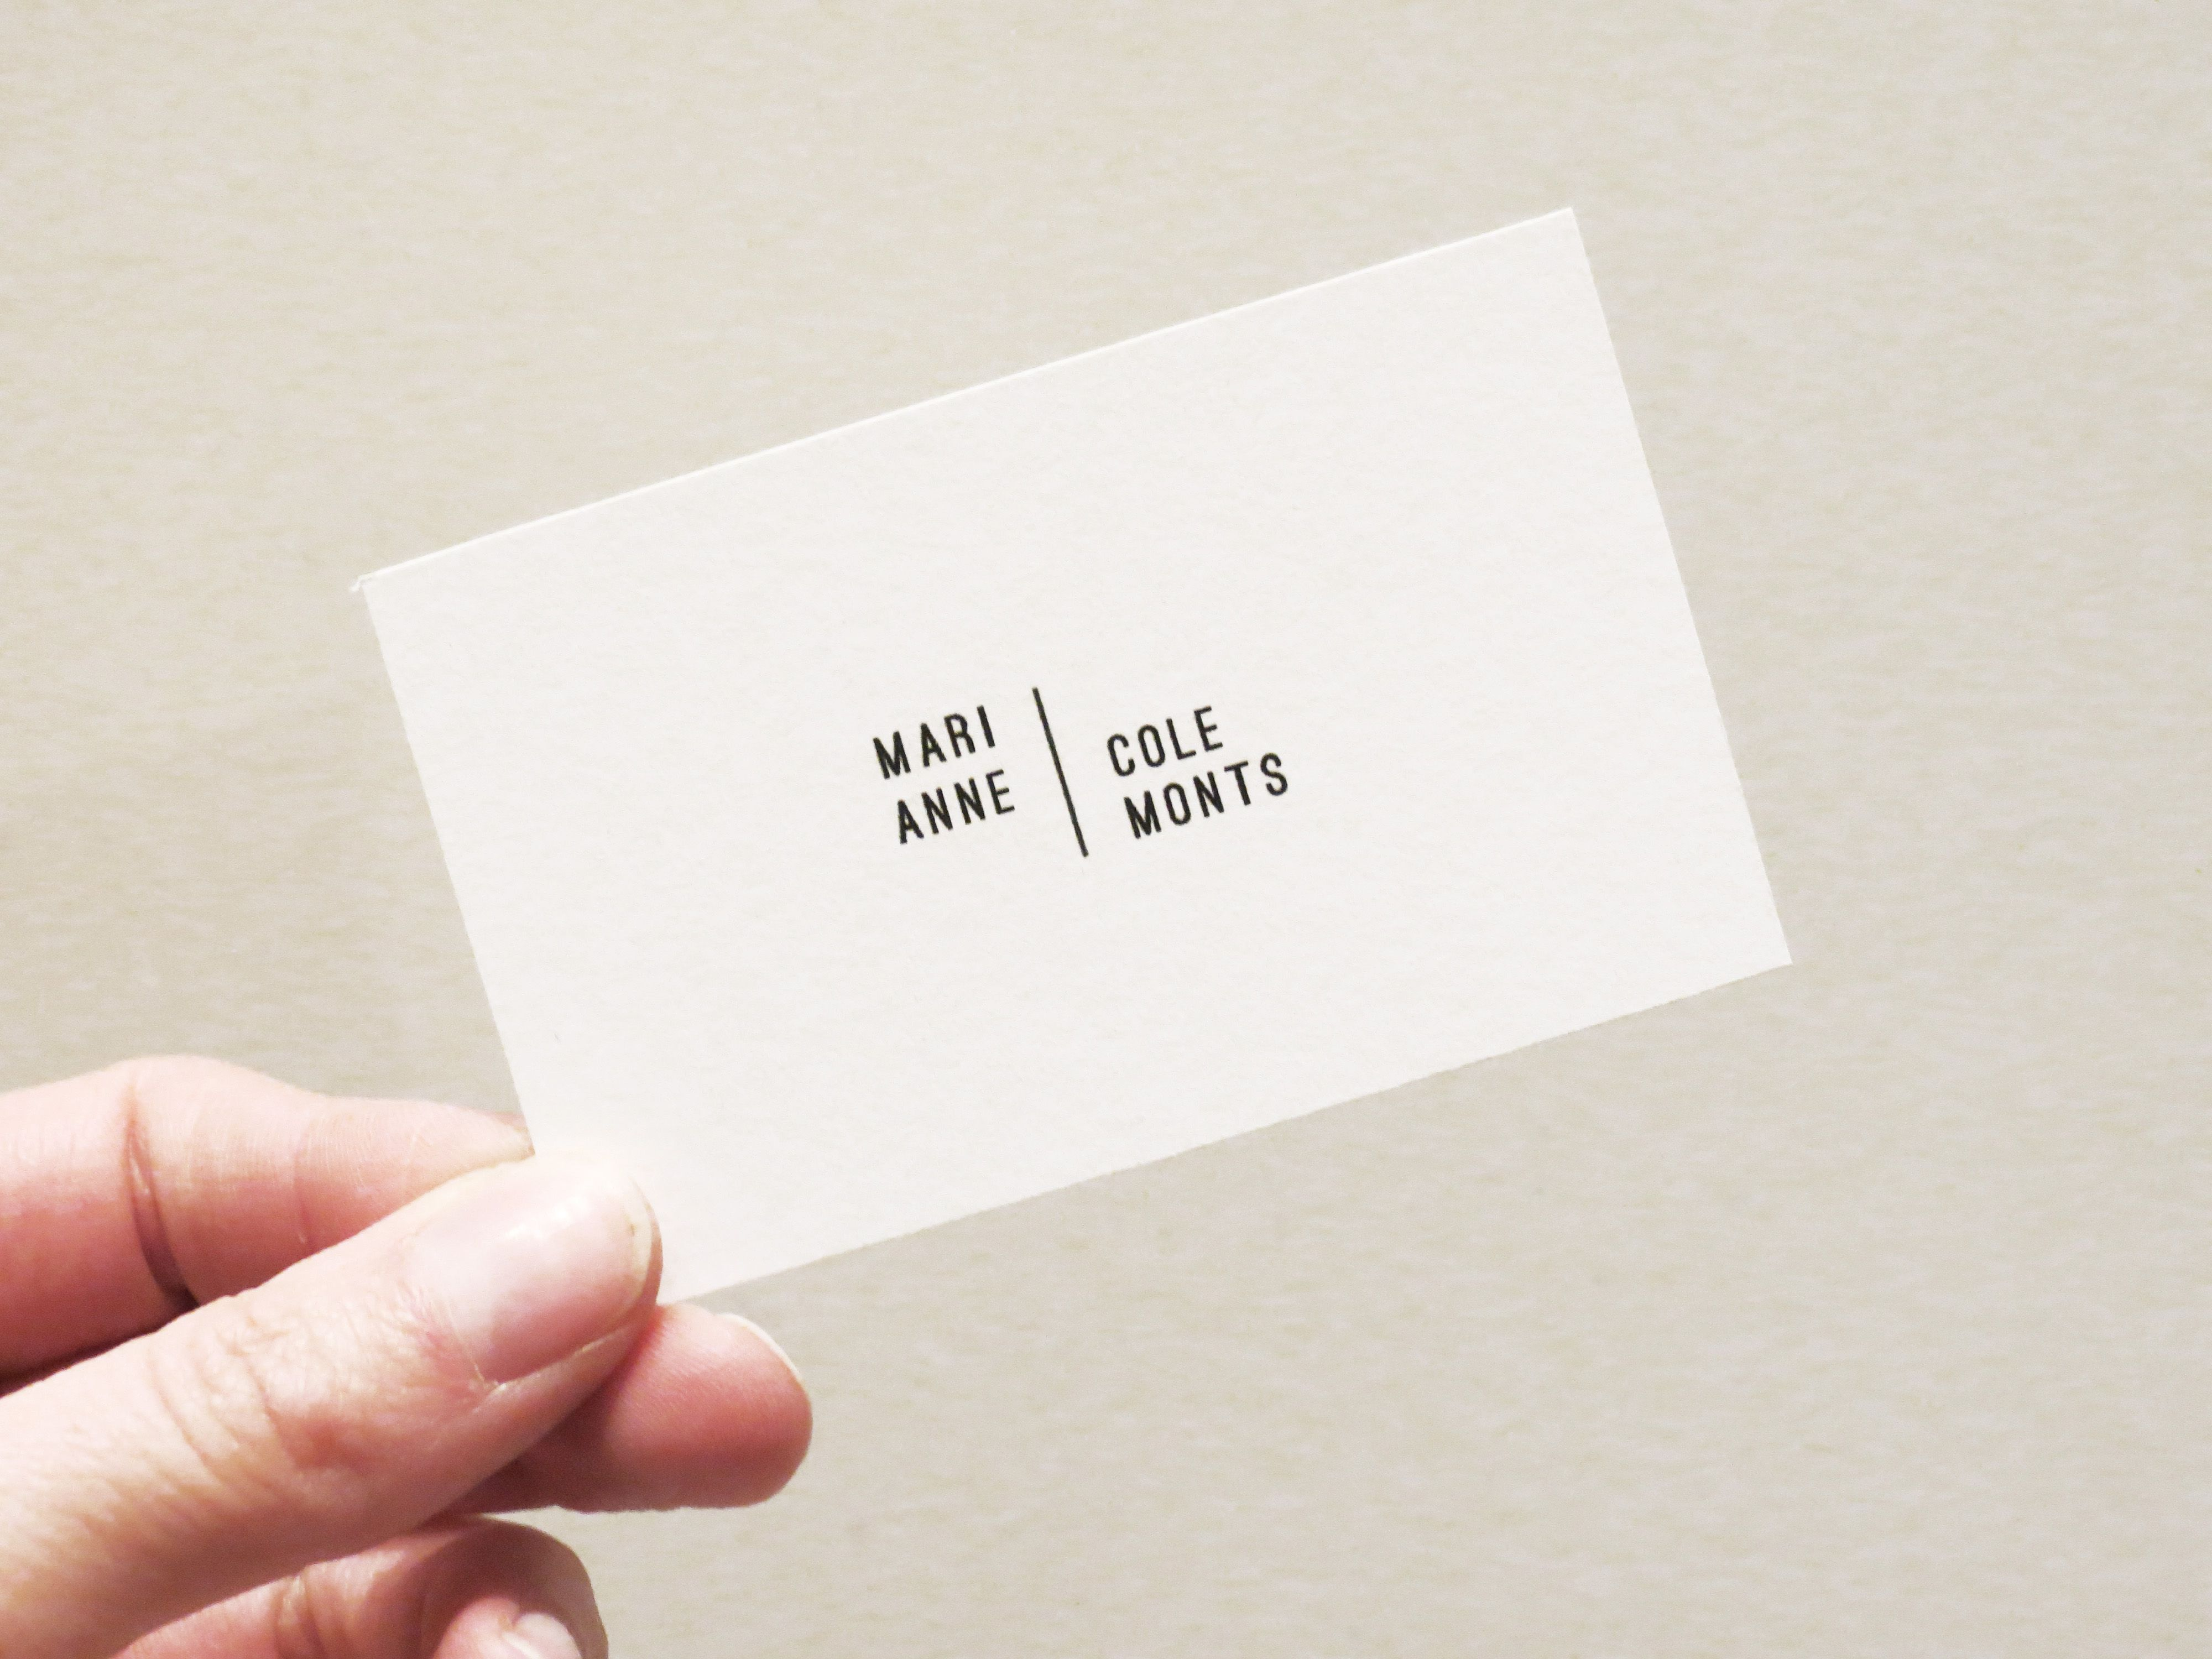 Marianne Colemonts. Artist Business Card.